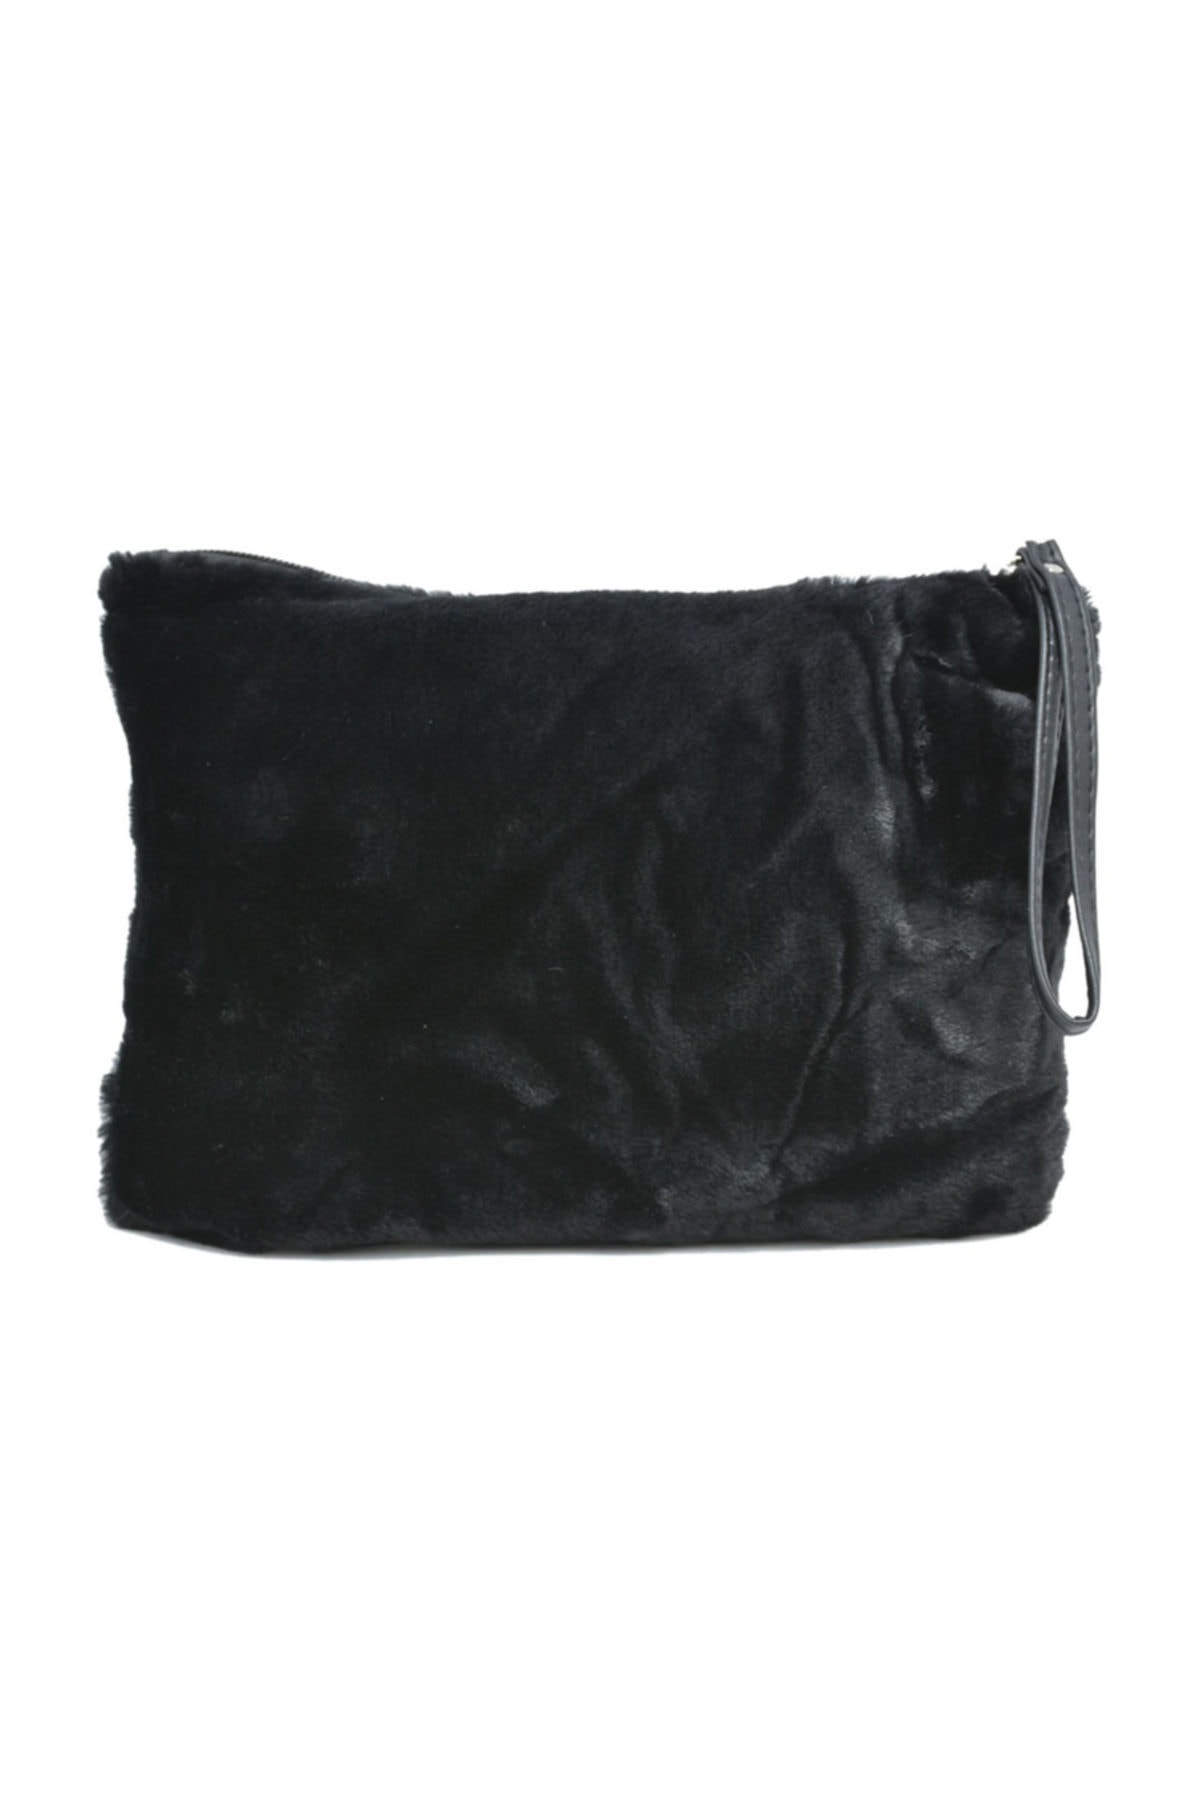 David Jones Kadın Clutch Çanta Siyah 1